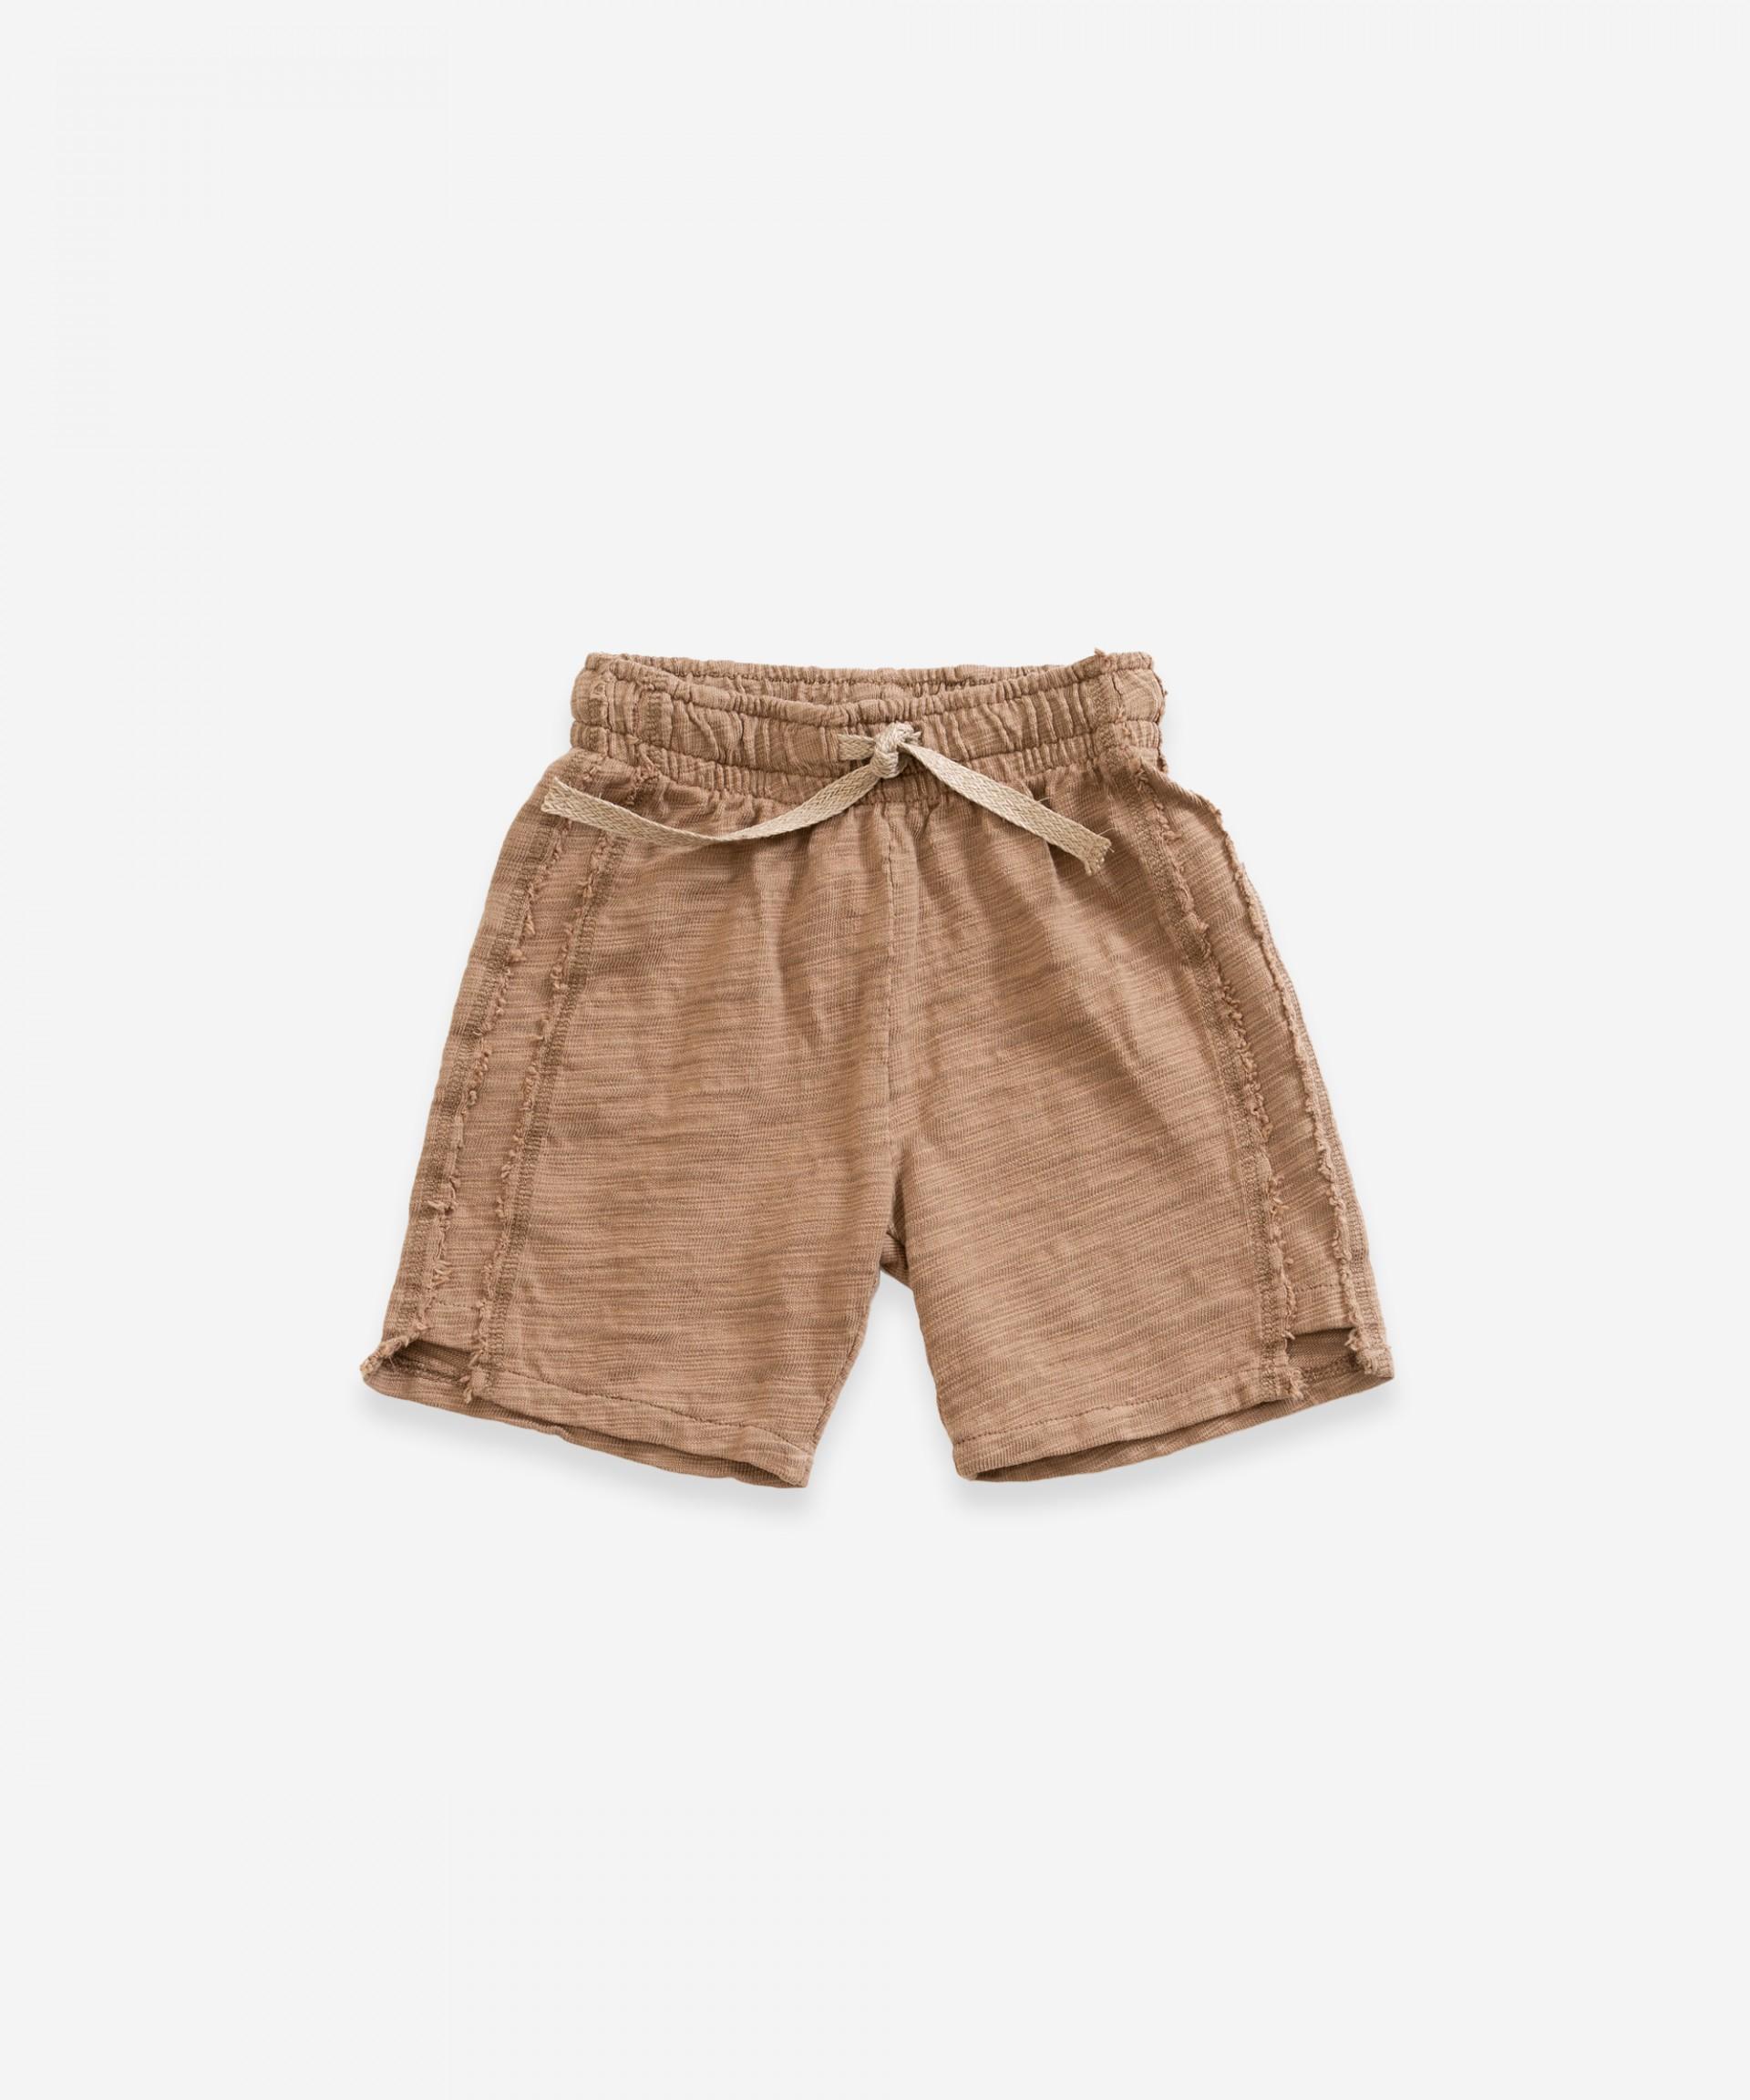 Pantaloncini in maglia | Weaving